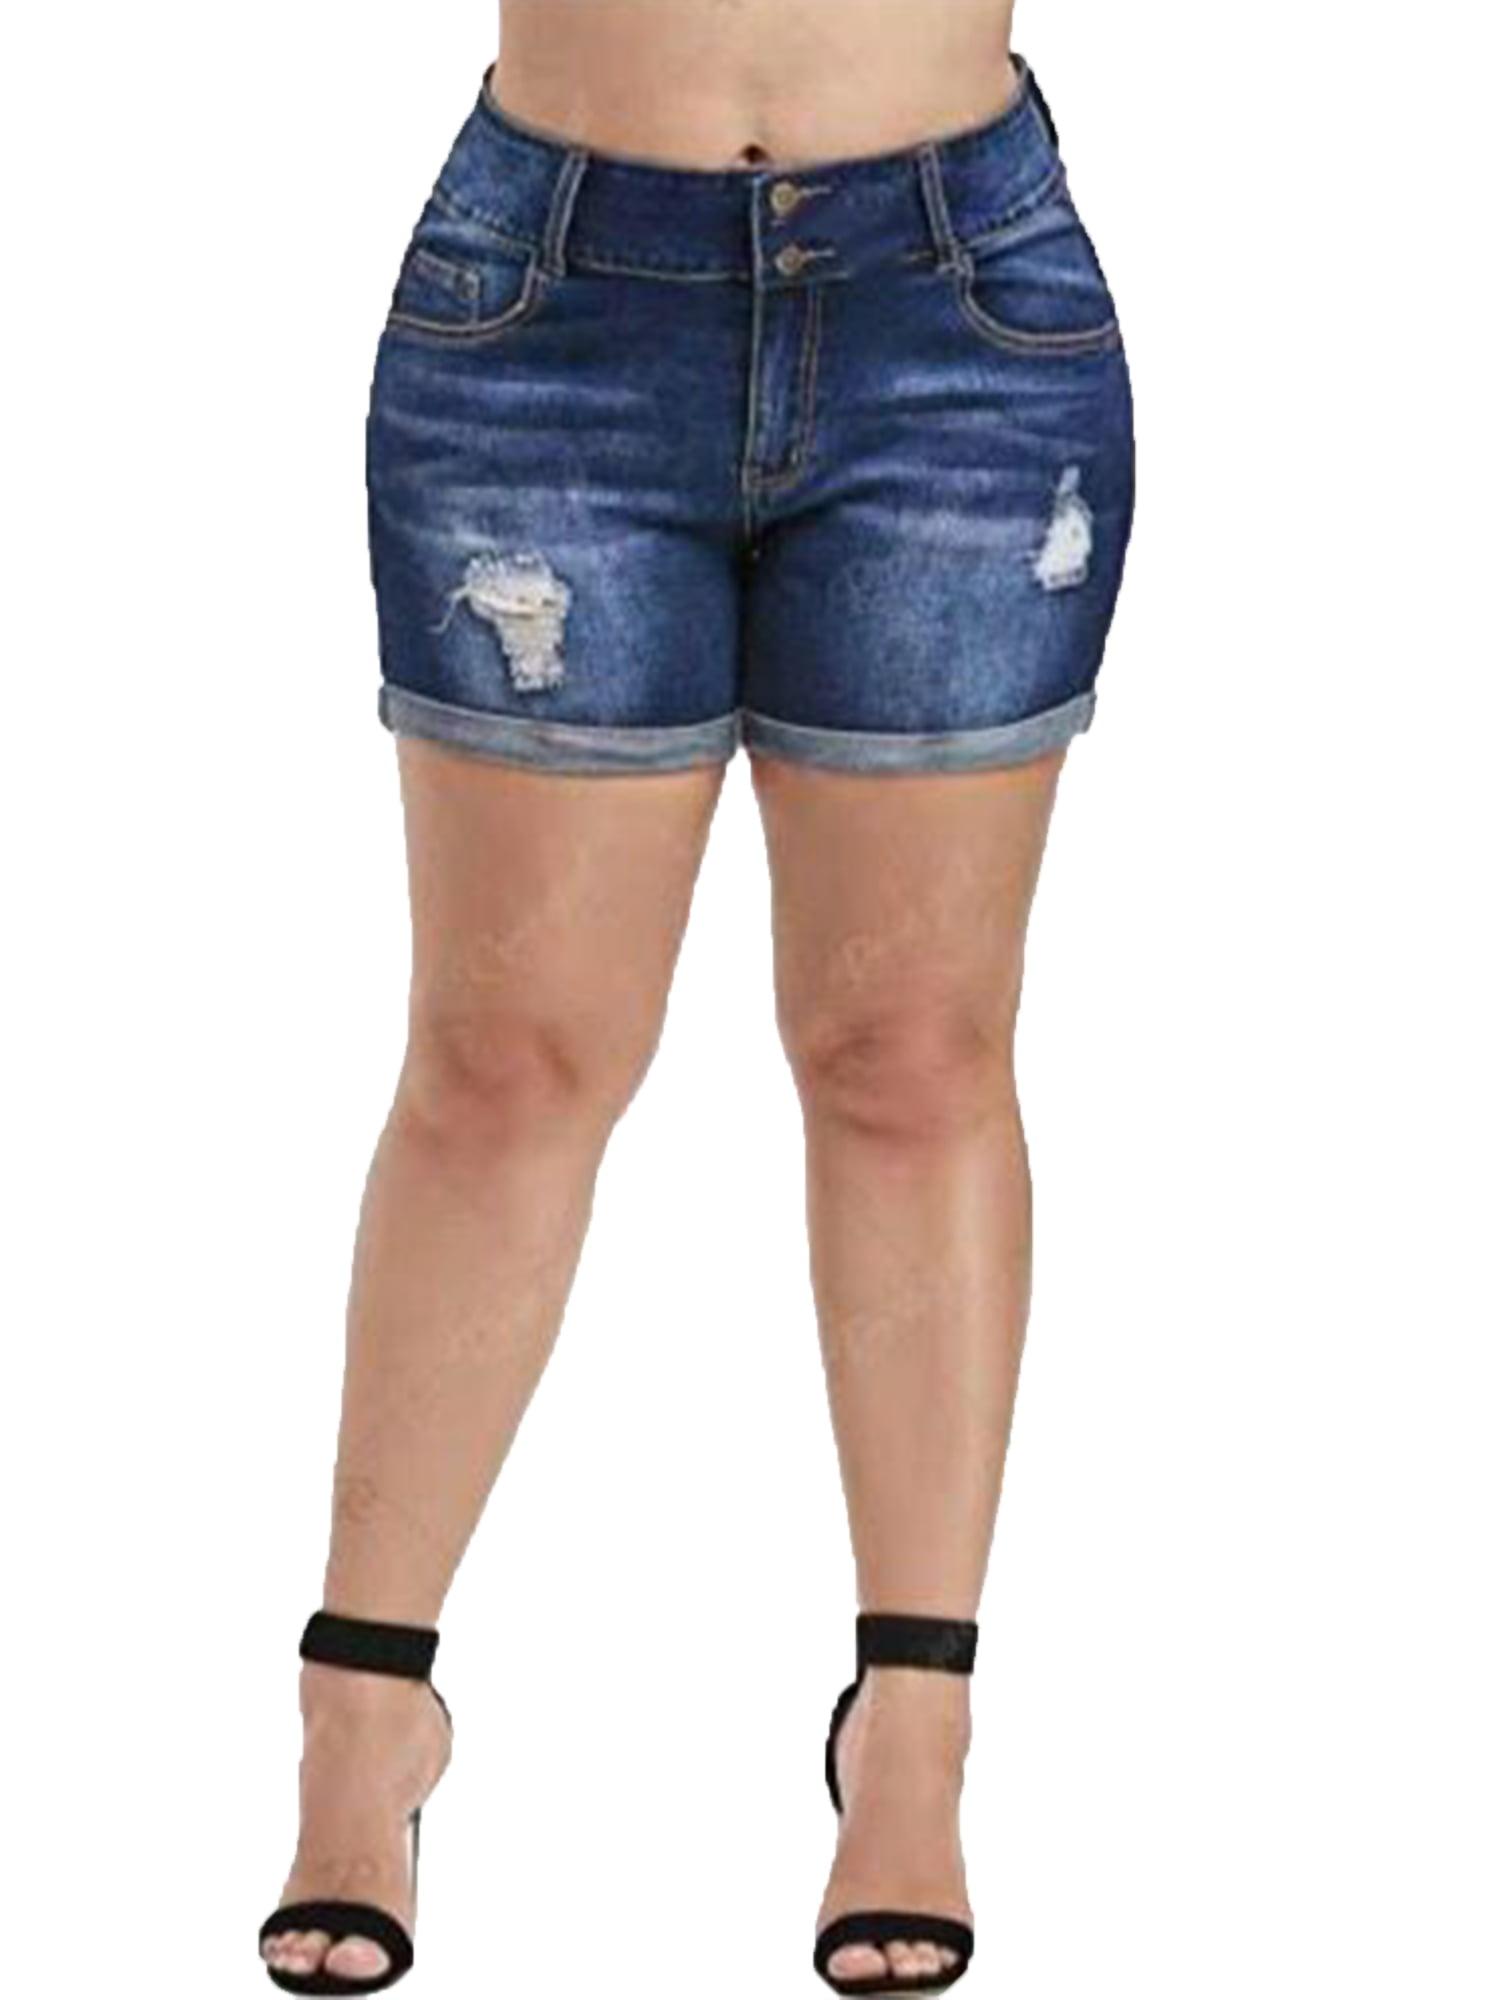 Women High Waisted Short Mini Jeans Denim Ripped Summer Casual Shorts Hot Pants